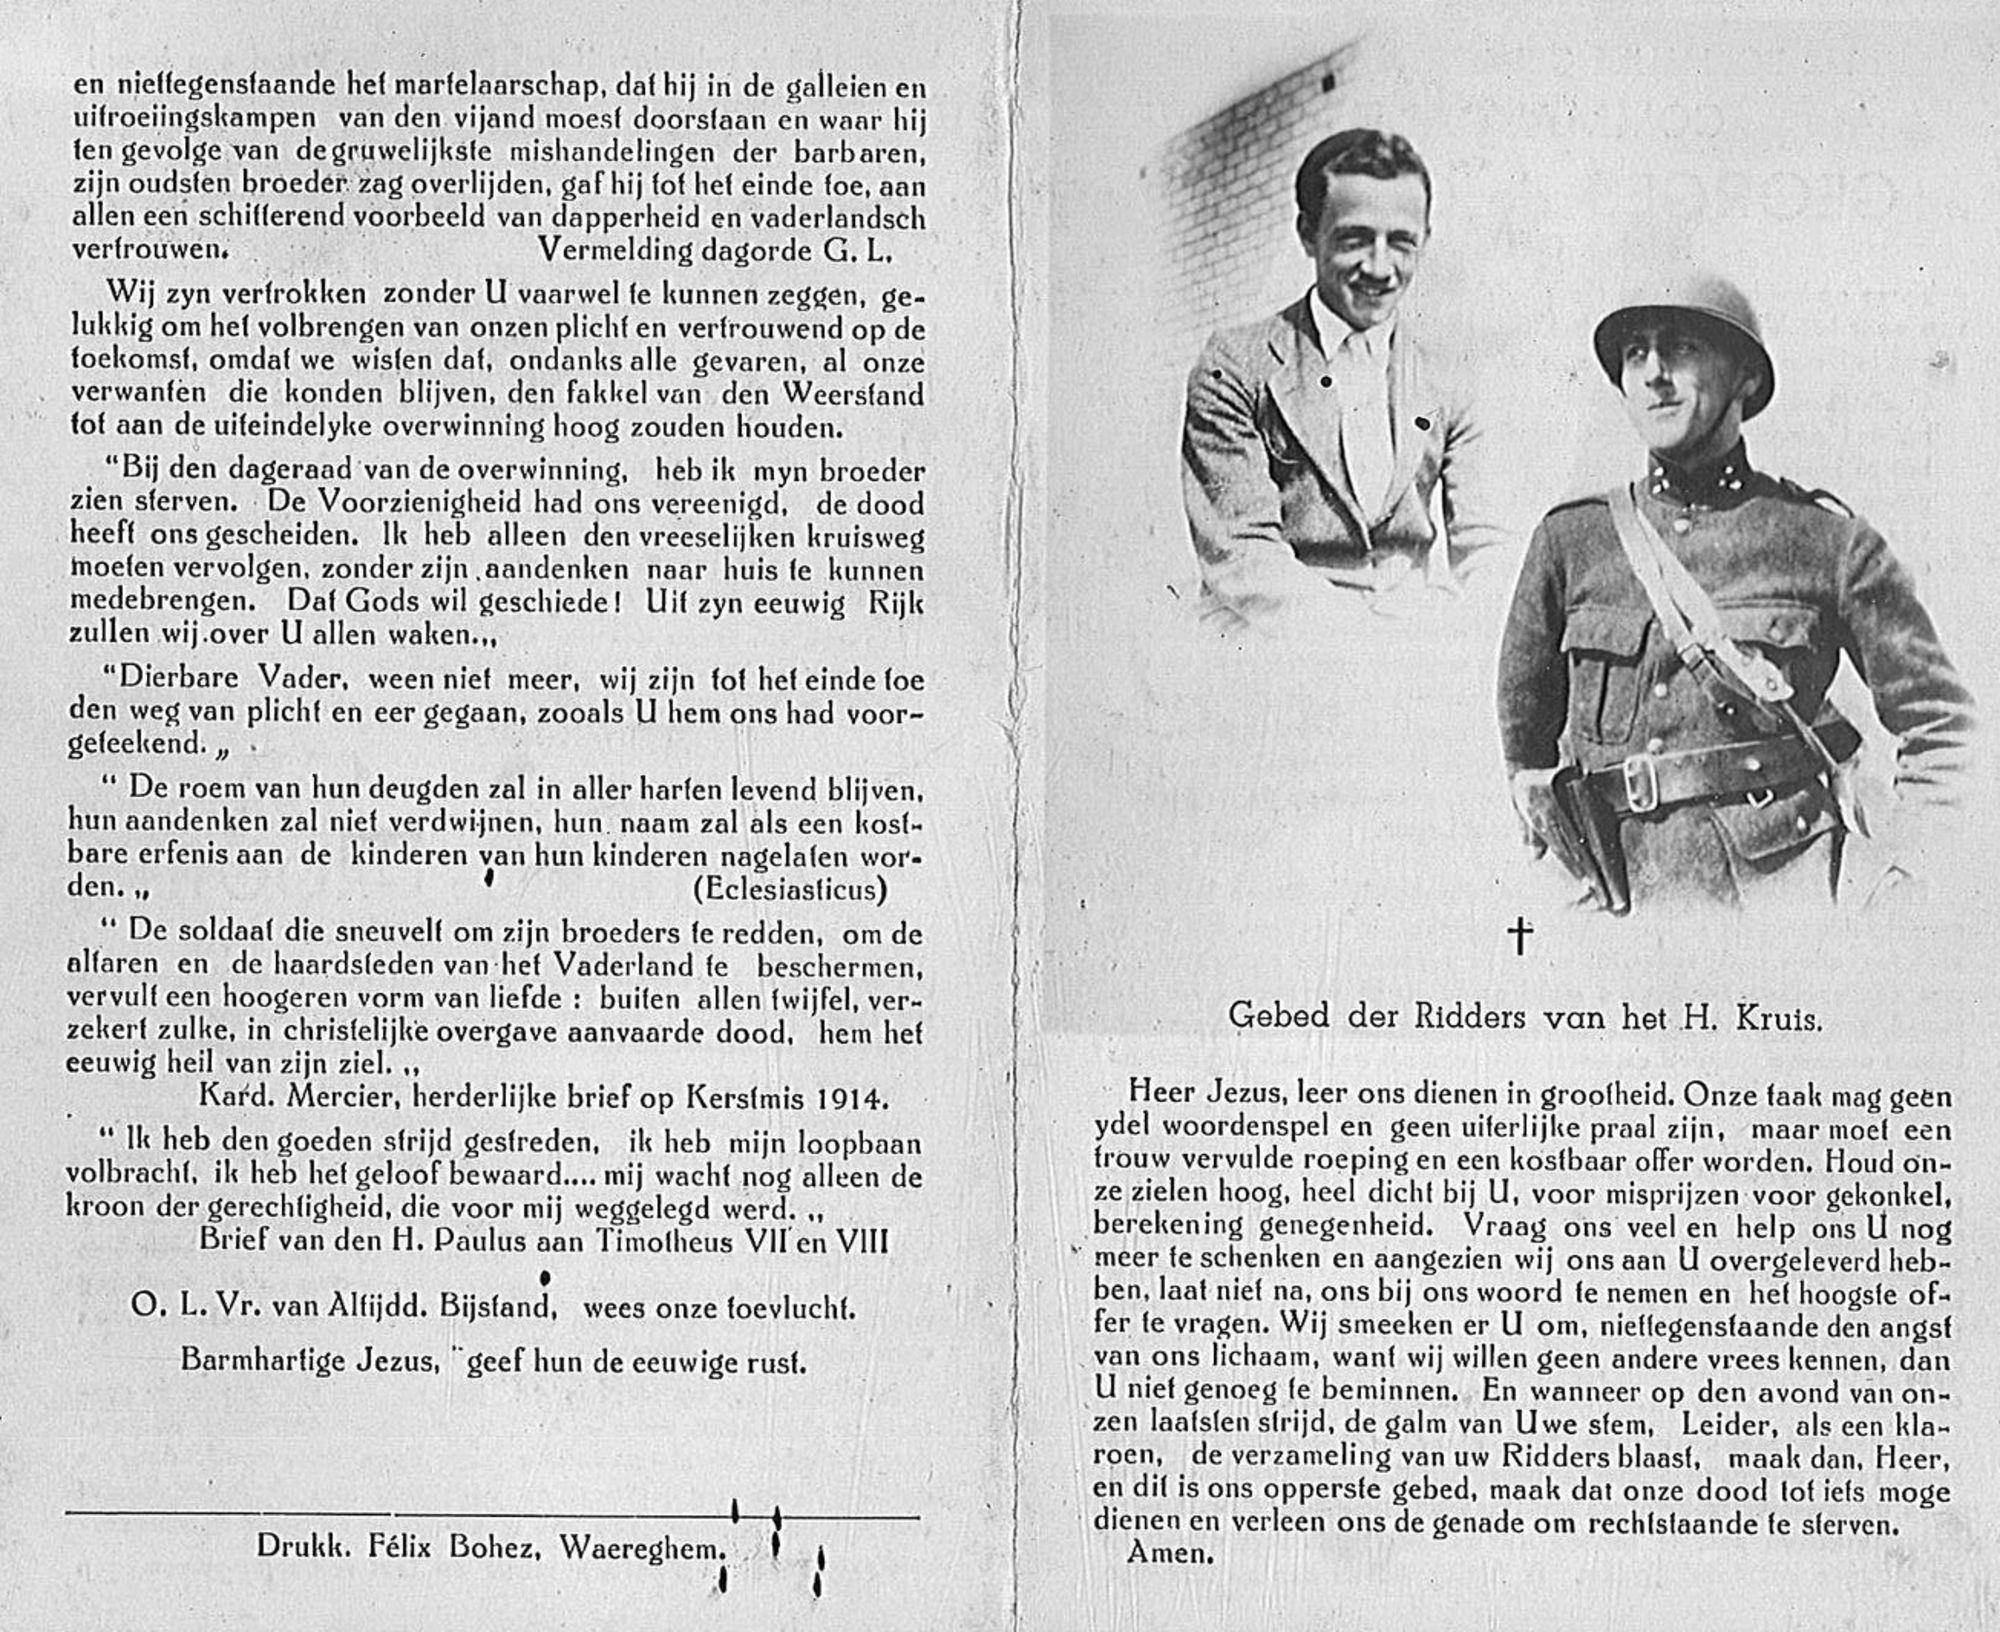 Georges en Gauthier de Groote